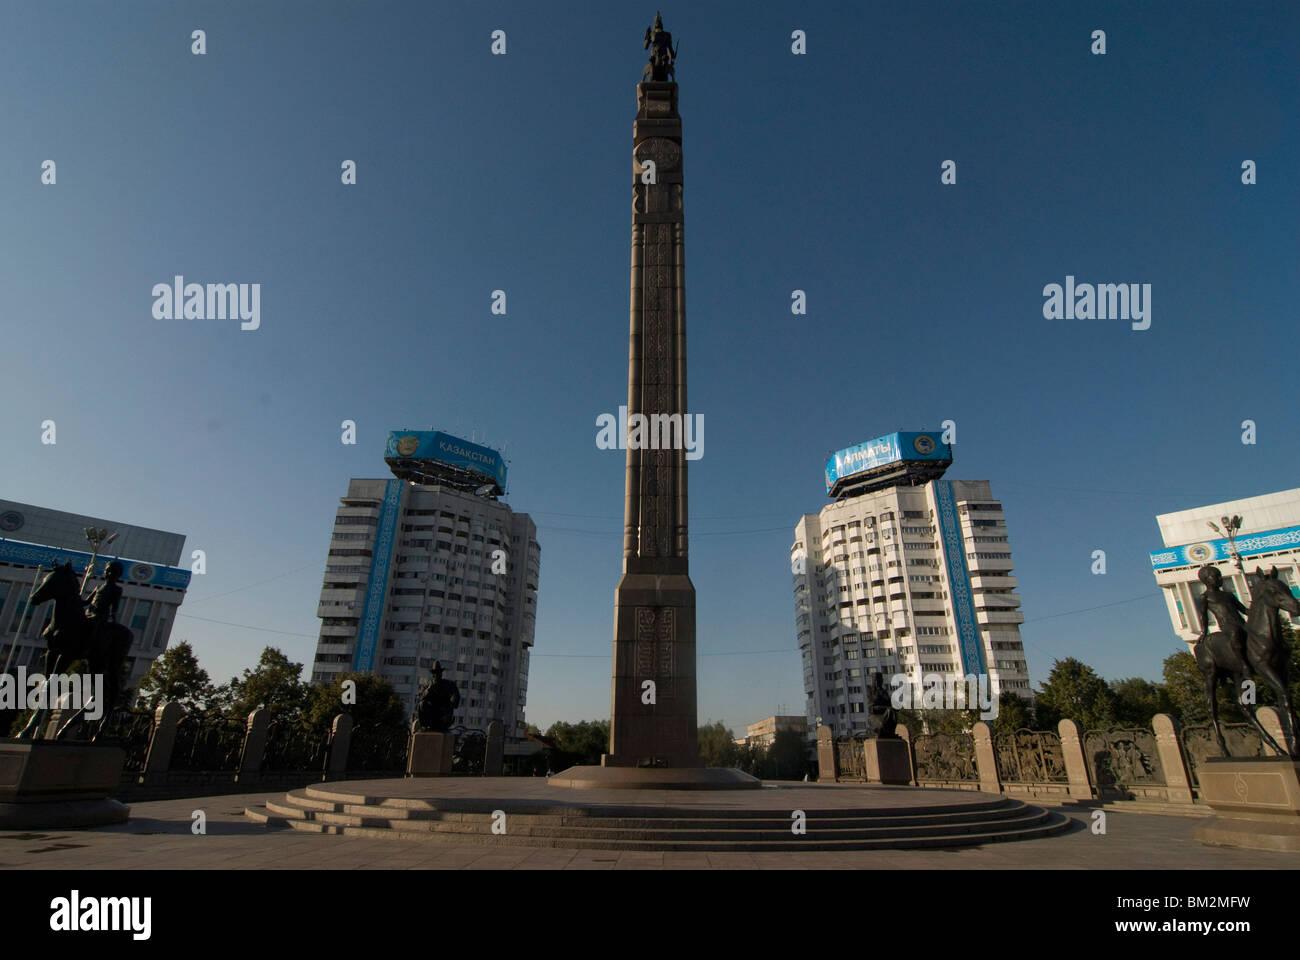 Monument of Independence obelisk, Alma Ata, Kazakhstan - Stock Image